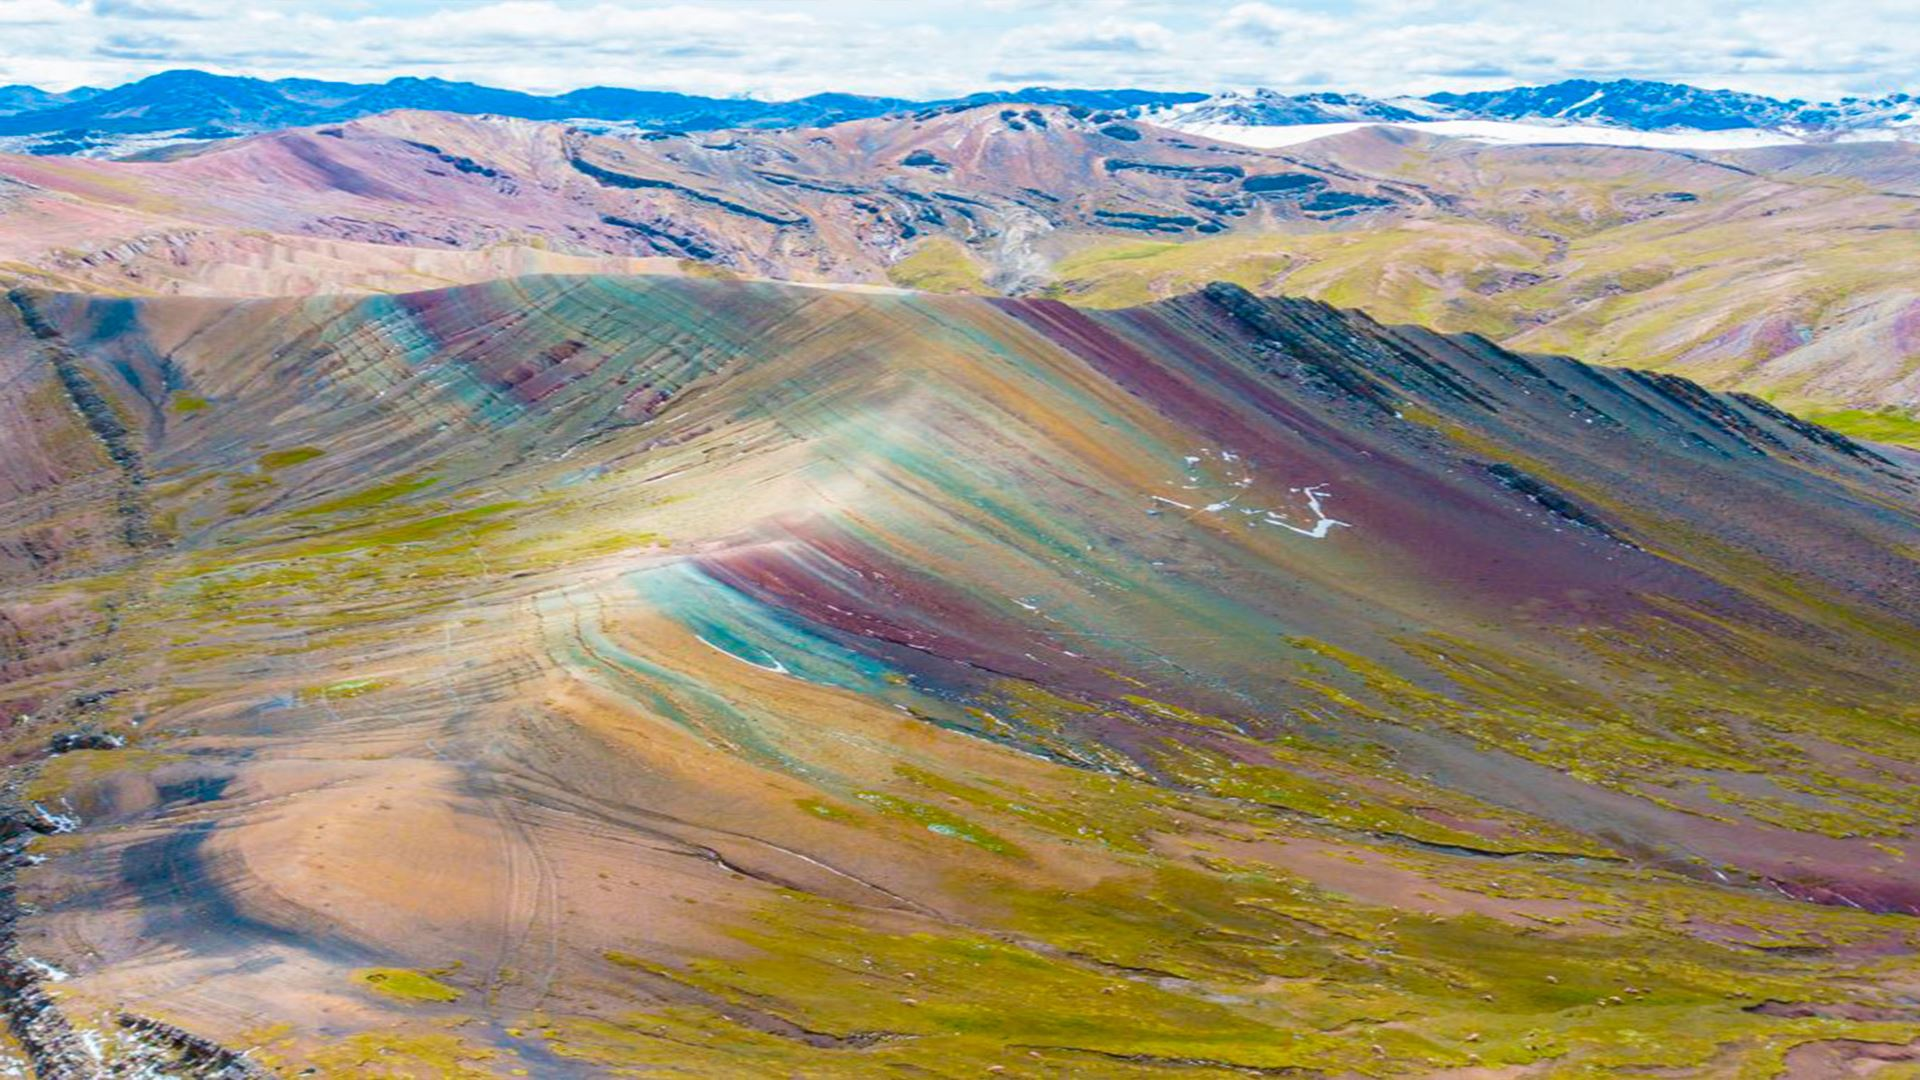 Palcoyo - Rainbow Mountain Trek